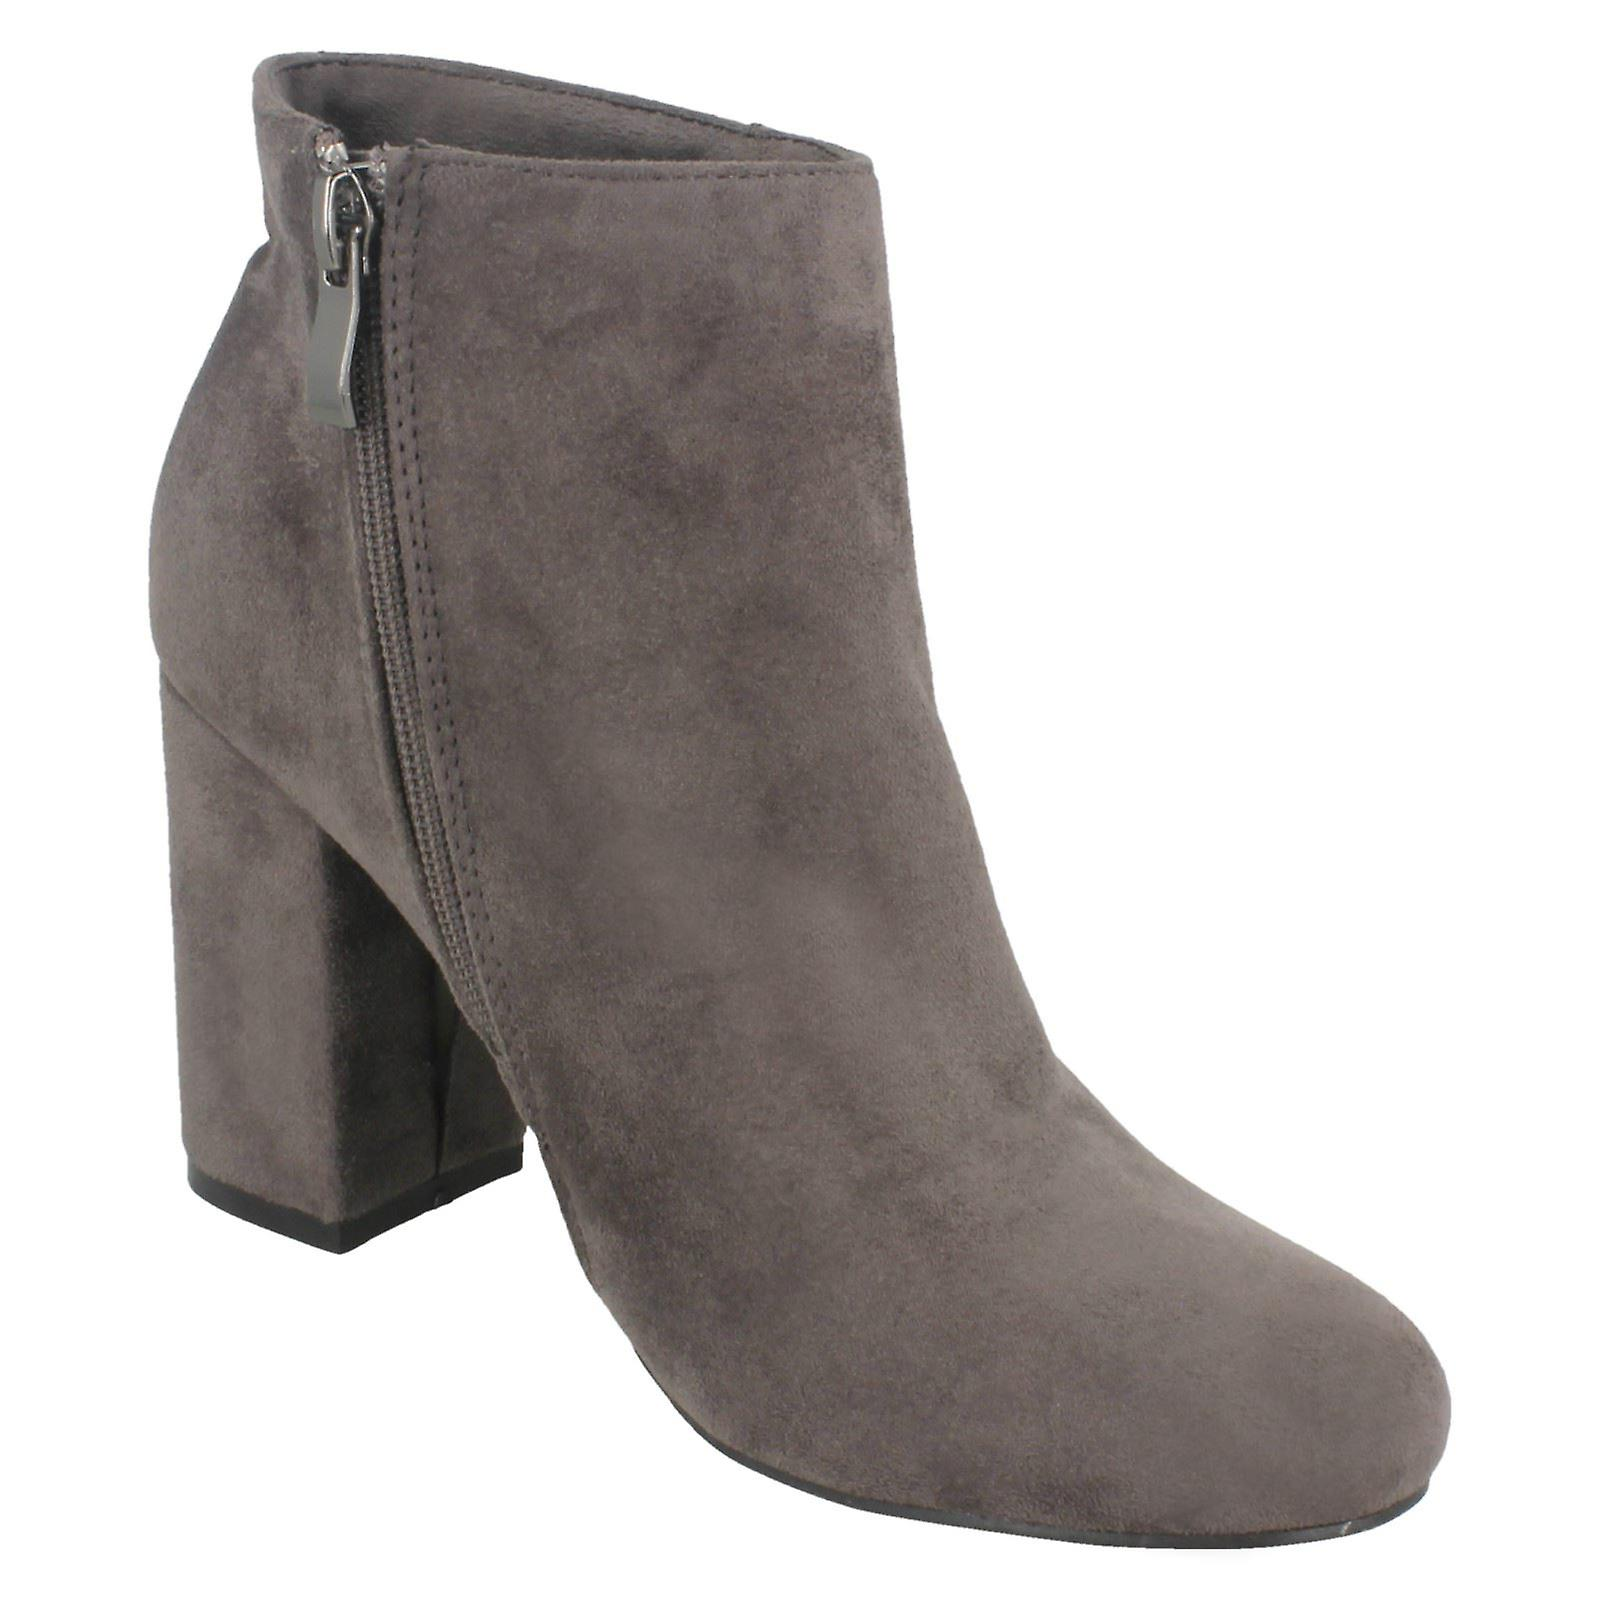 Ladies Spot On Blocked Heel Ankle Boots F50853